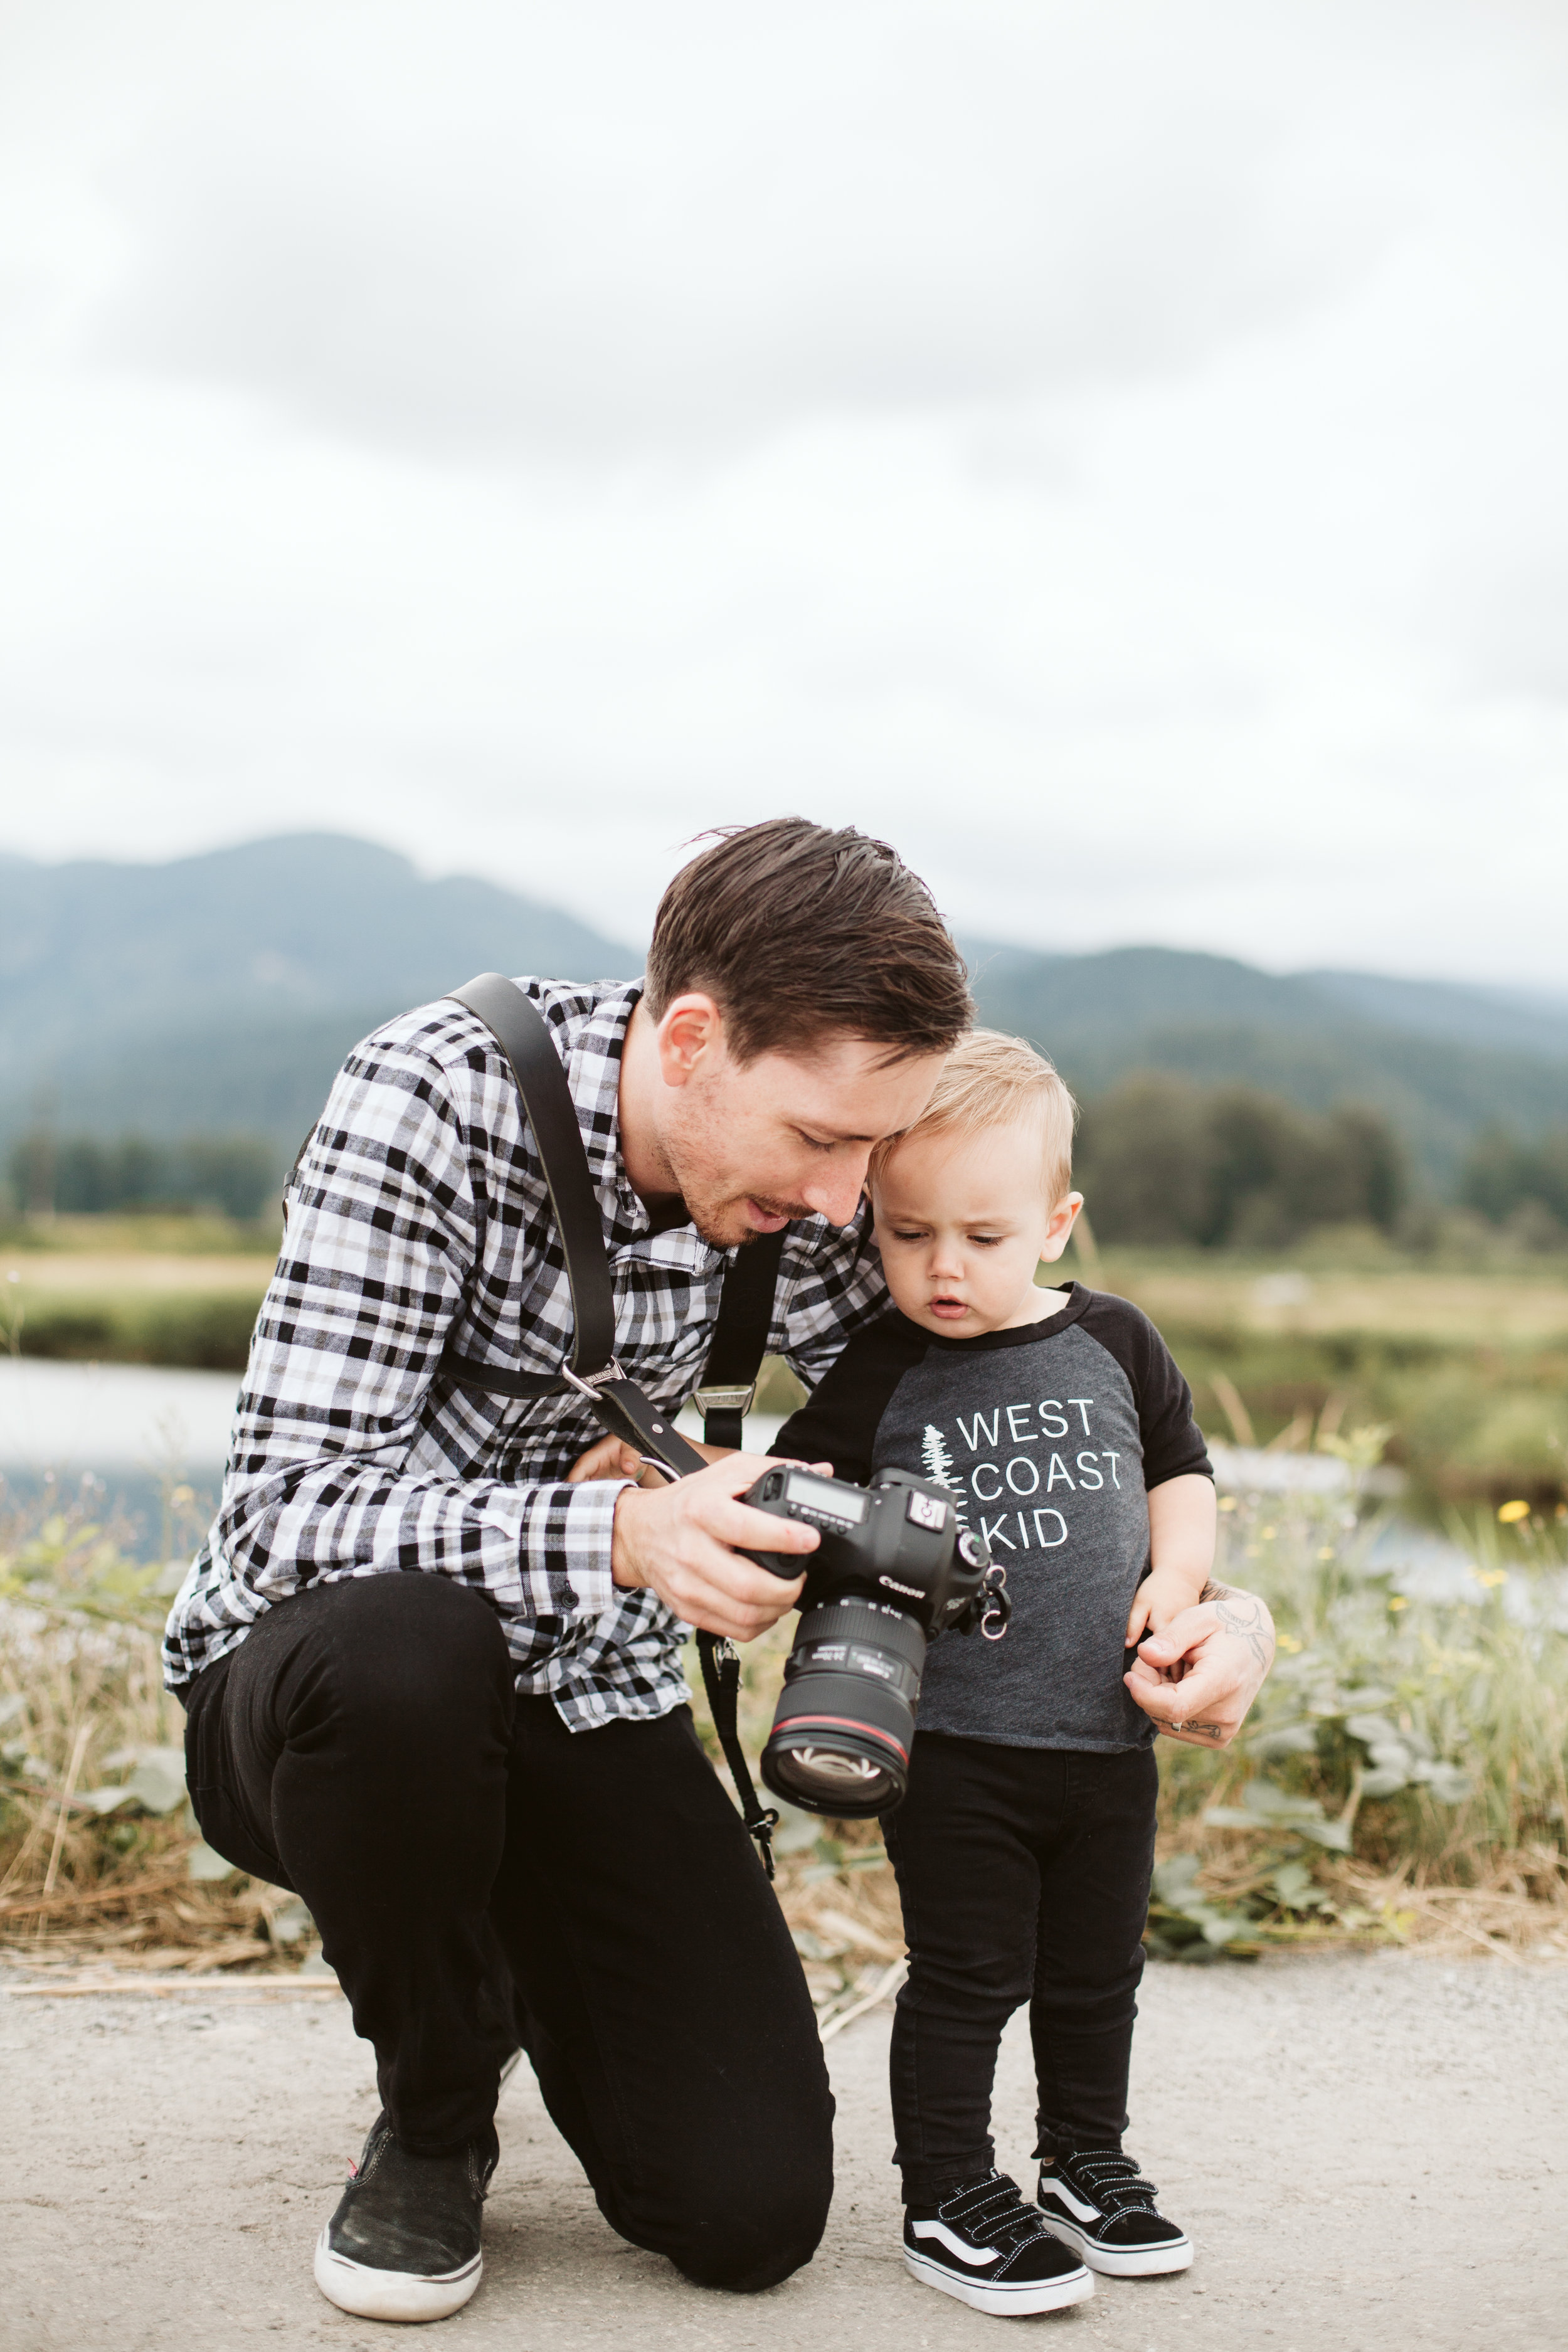 Jesse Holland - Photographer/Videographer